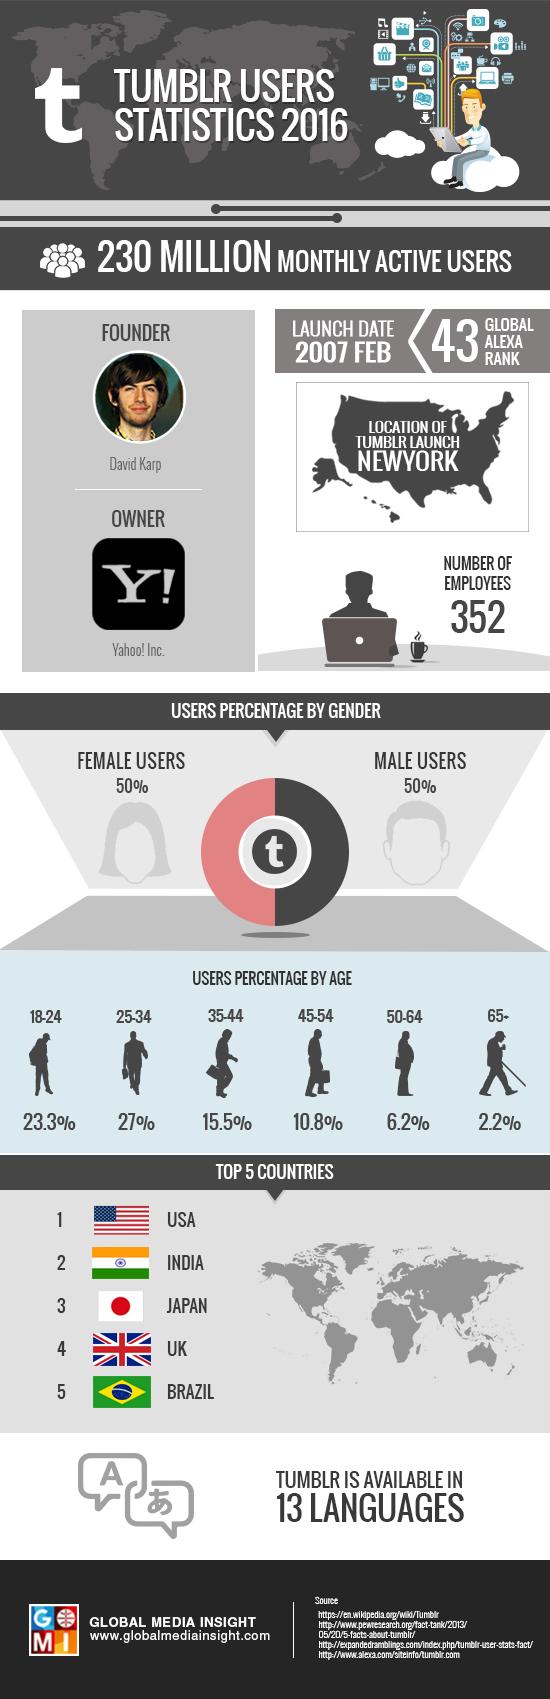 tumblr-users-statistics-2016